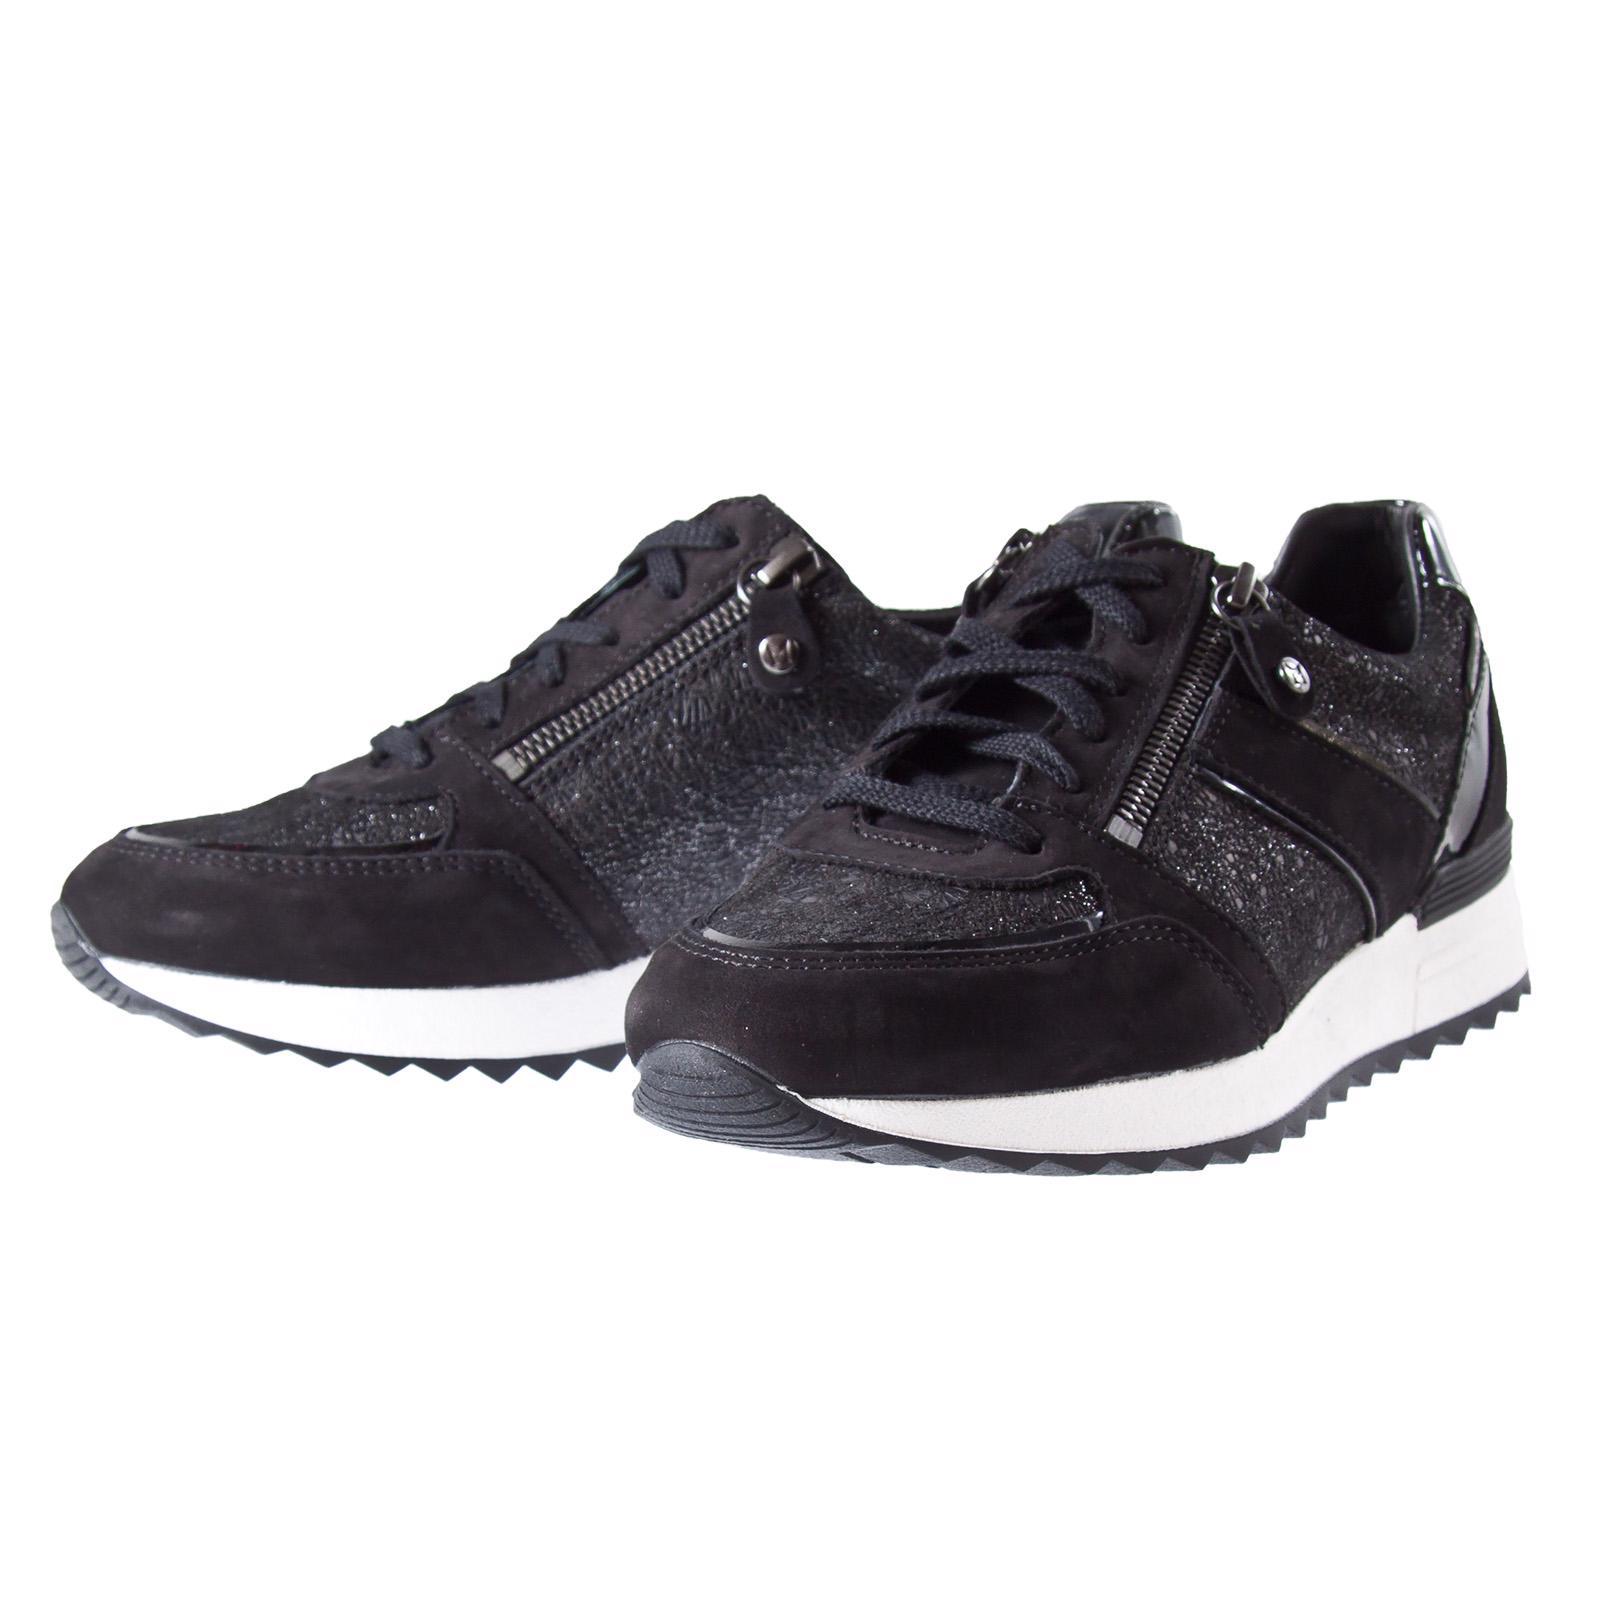 Chaussures Para Botte Noire xUG7fA